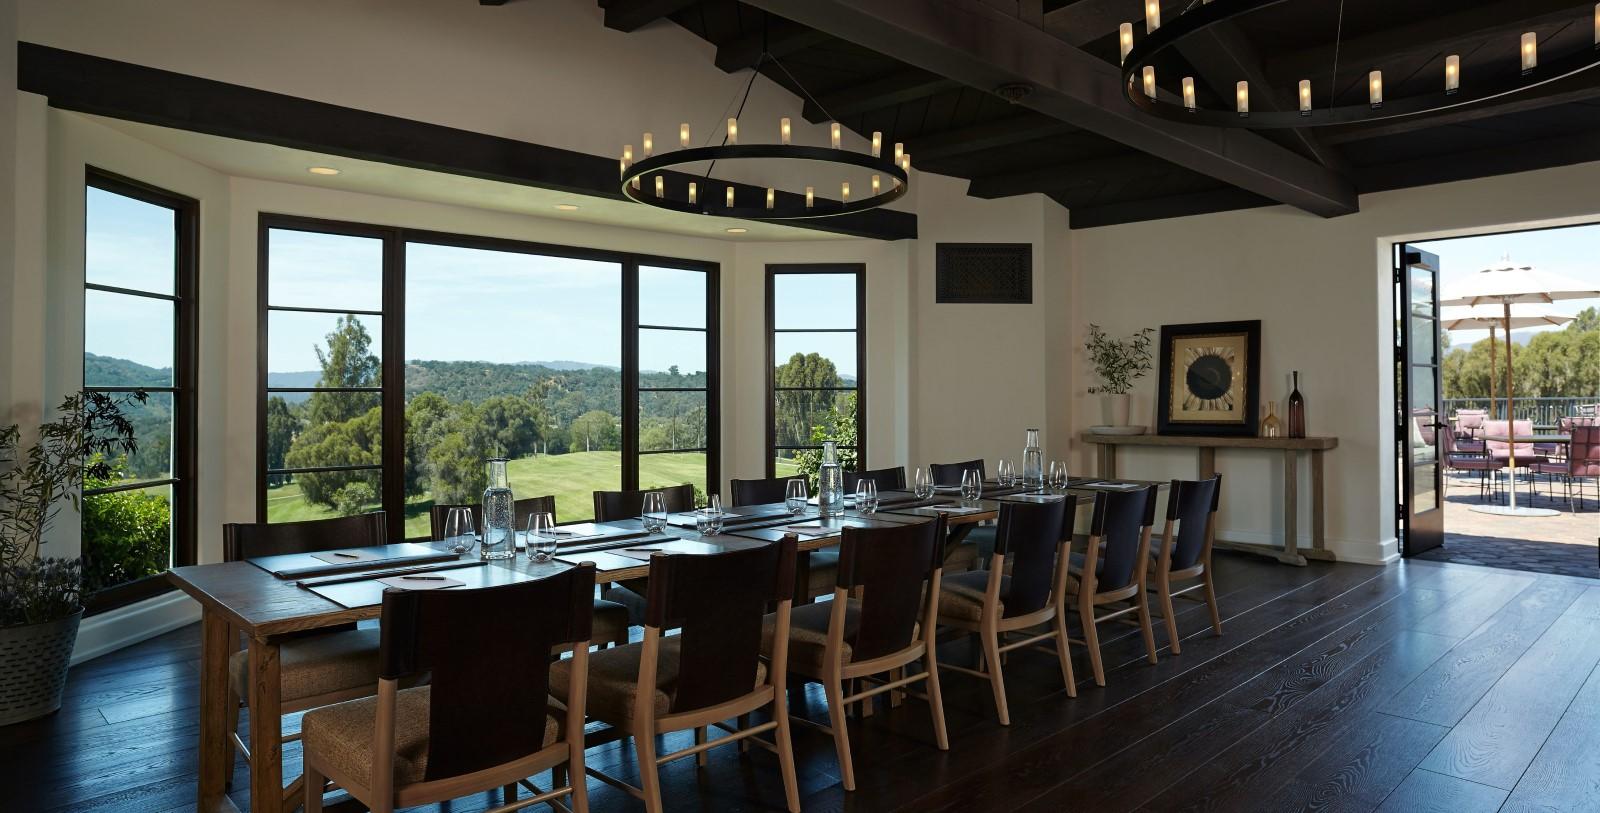 Image of Olivella Dining Area, Ojai Valley Inn, Ojai, California, 1923, Member of Historic Hotels of America, RFP